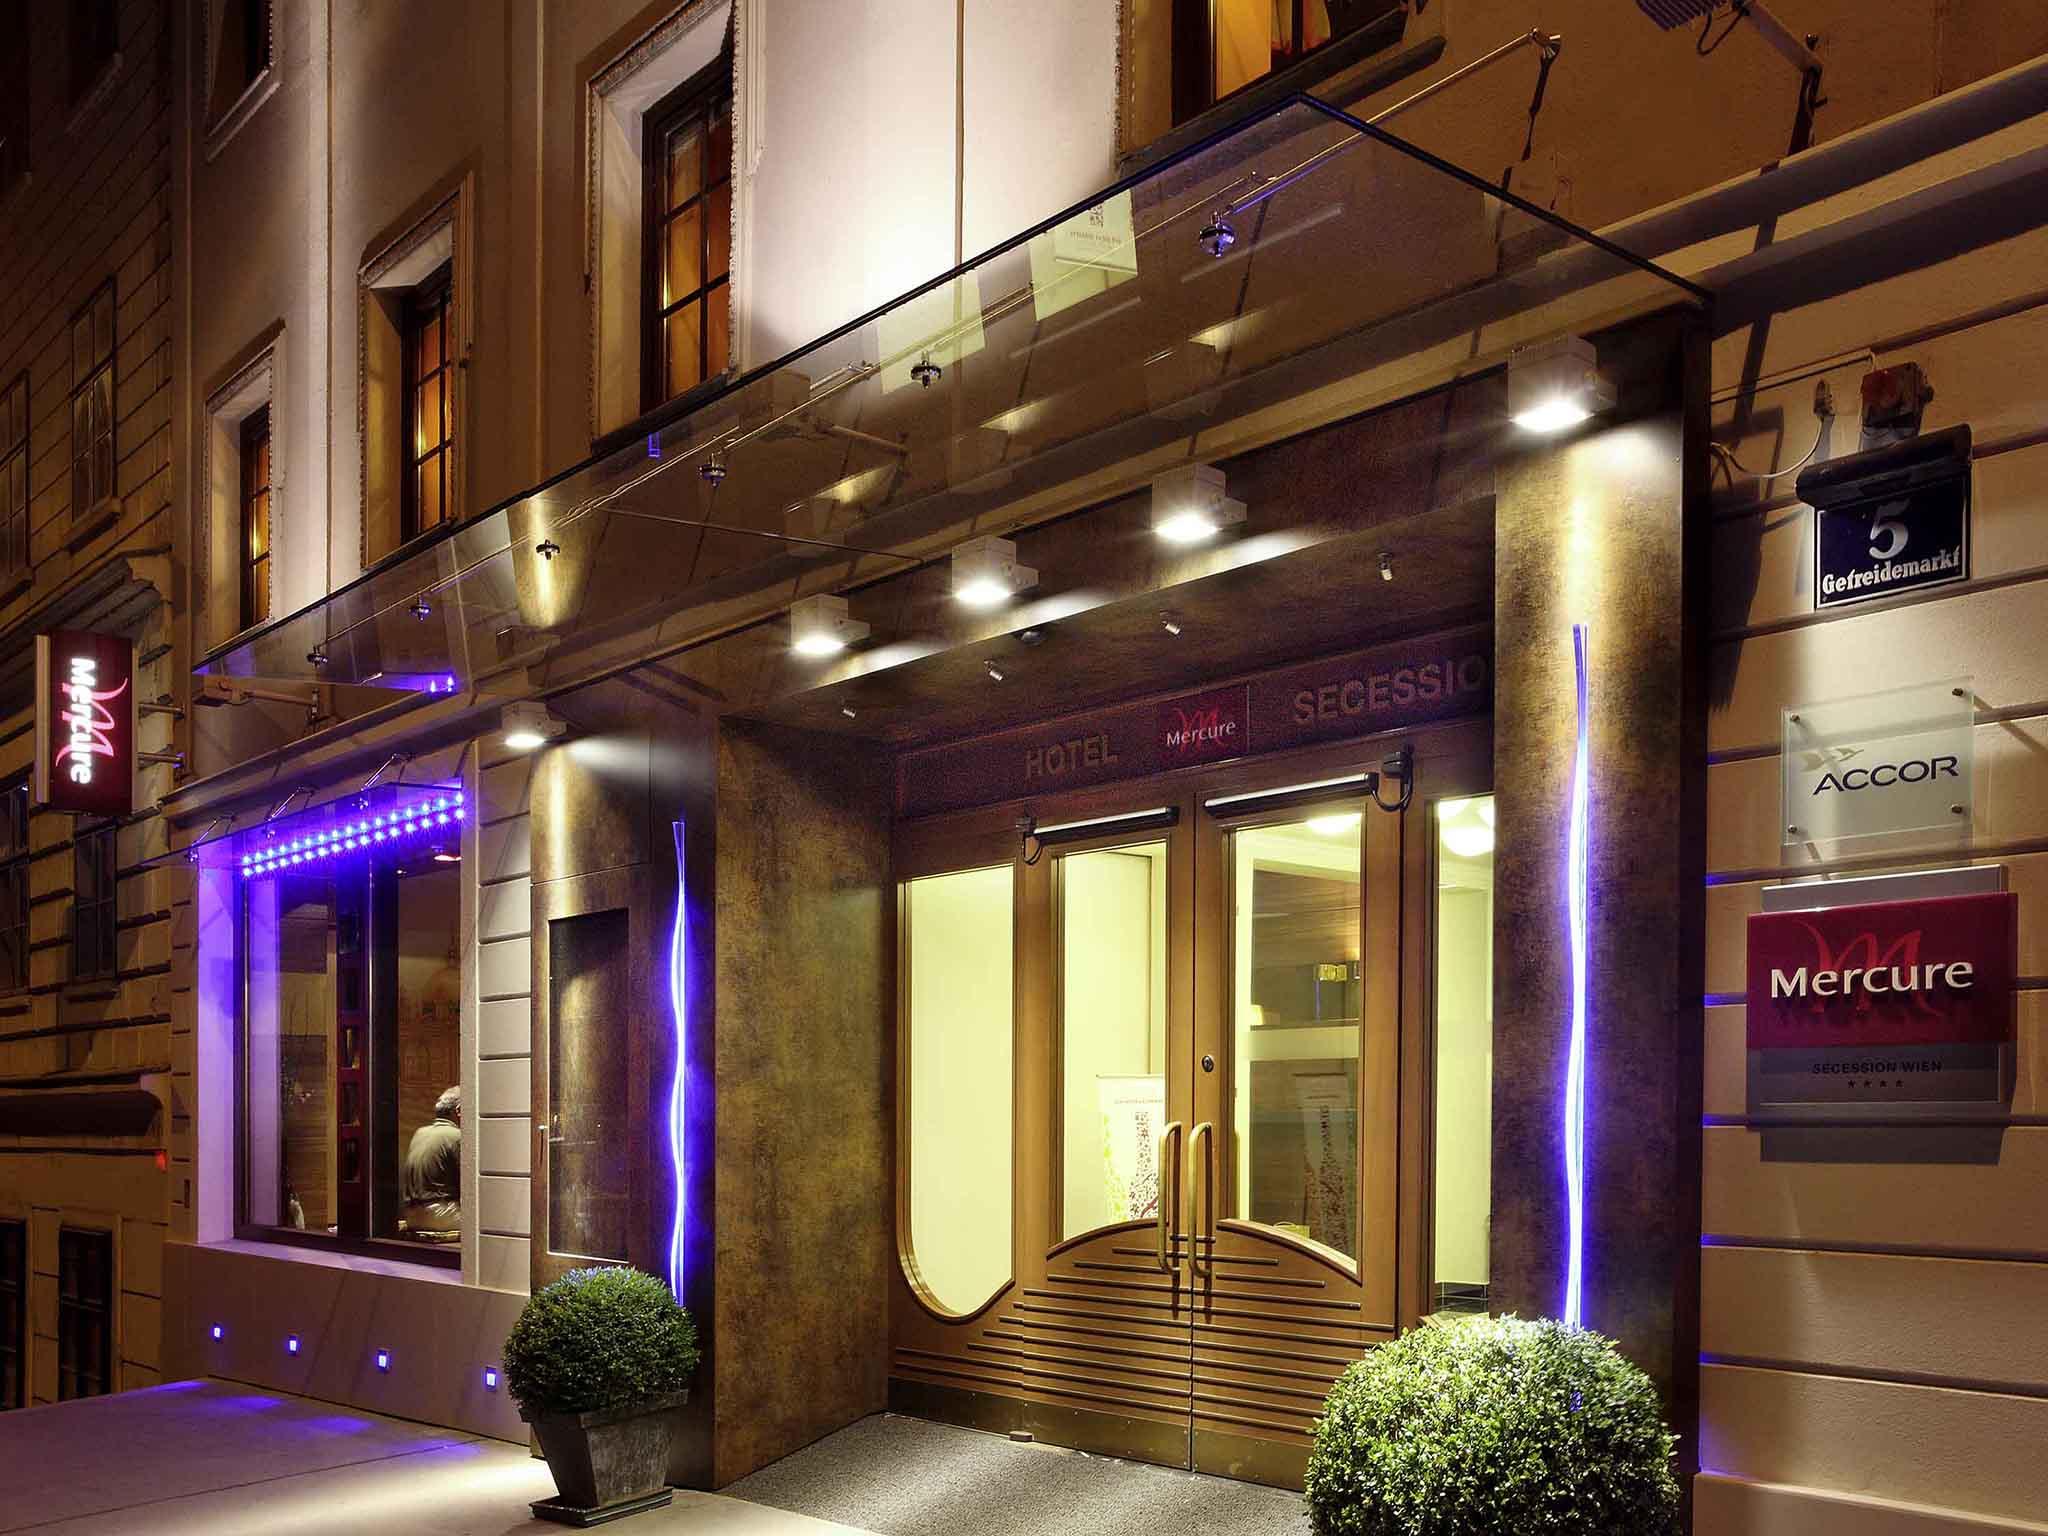 Hotel – Hotel Mercure Secession Wien